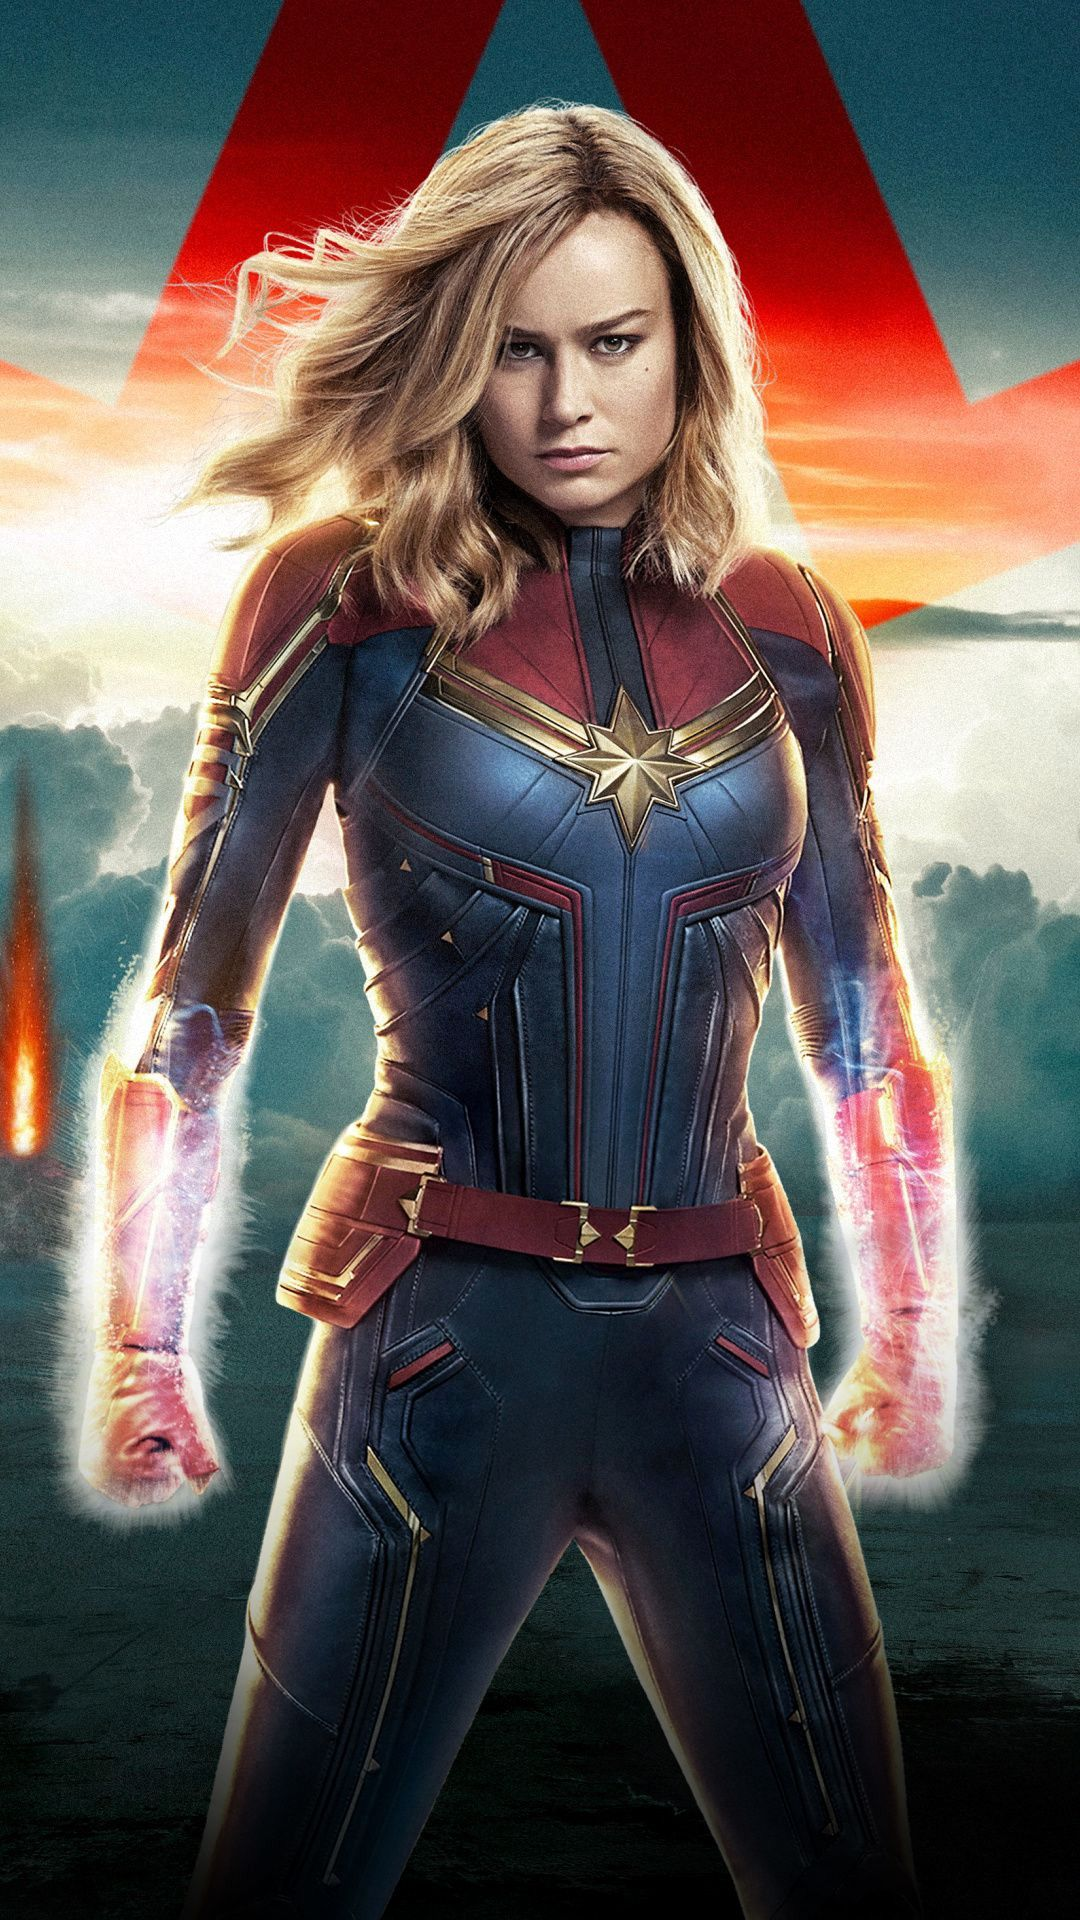 Captain Marvel Wallpaper Elegant Captain Marvel 2019 Movie Confident Wallpaper In 2020 Captain Marvel Marvel Cinematic Captain Marvel Carol Danvers